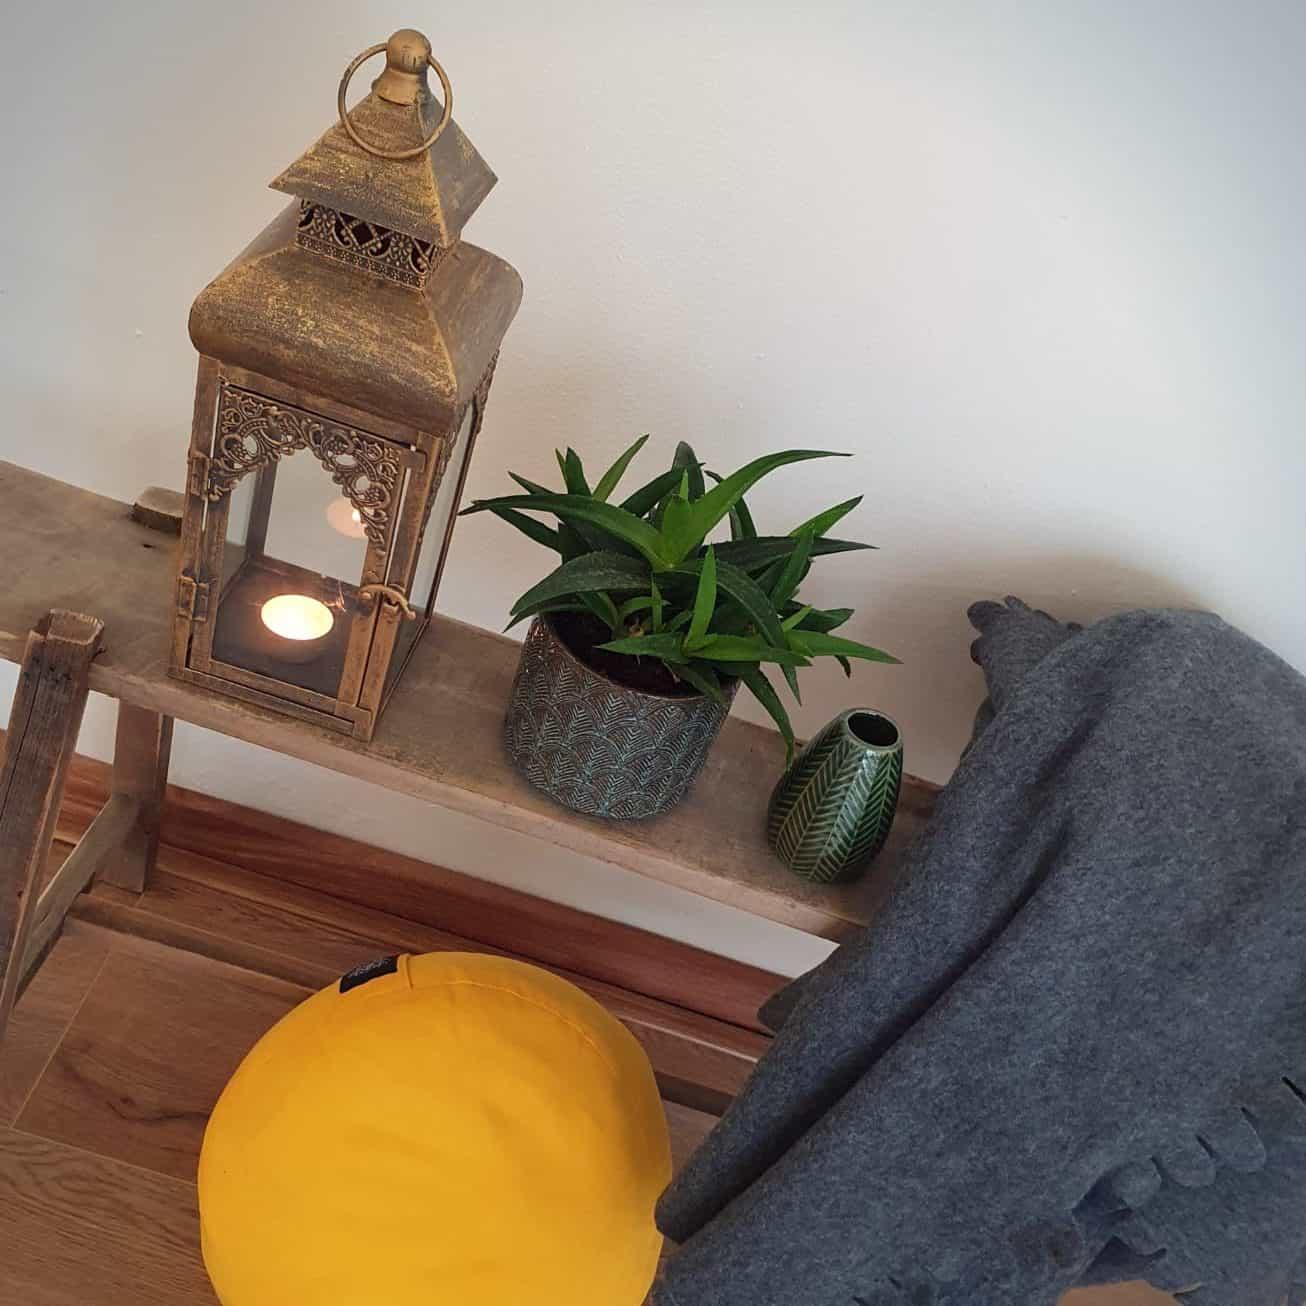 Meditatiegroep amersfoort